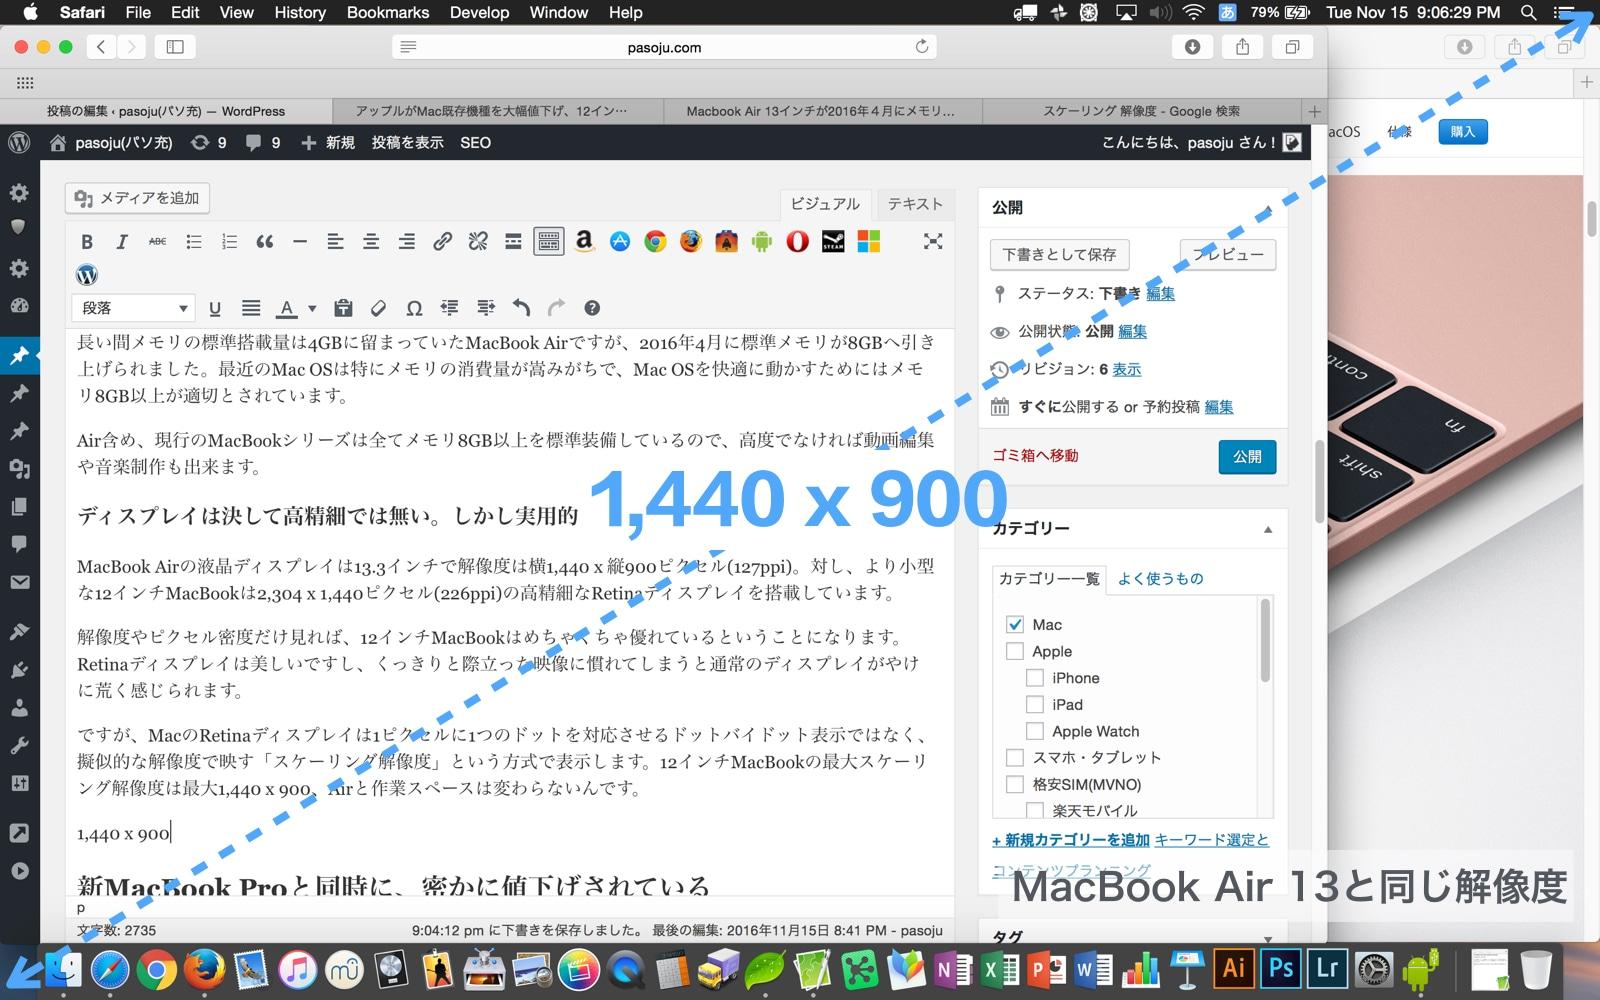 MacBook Air 解像度